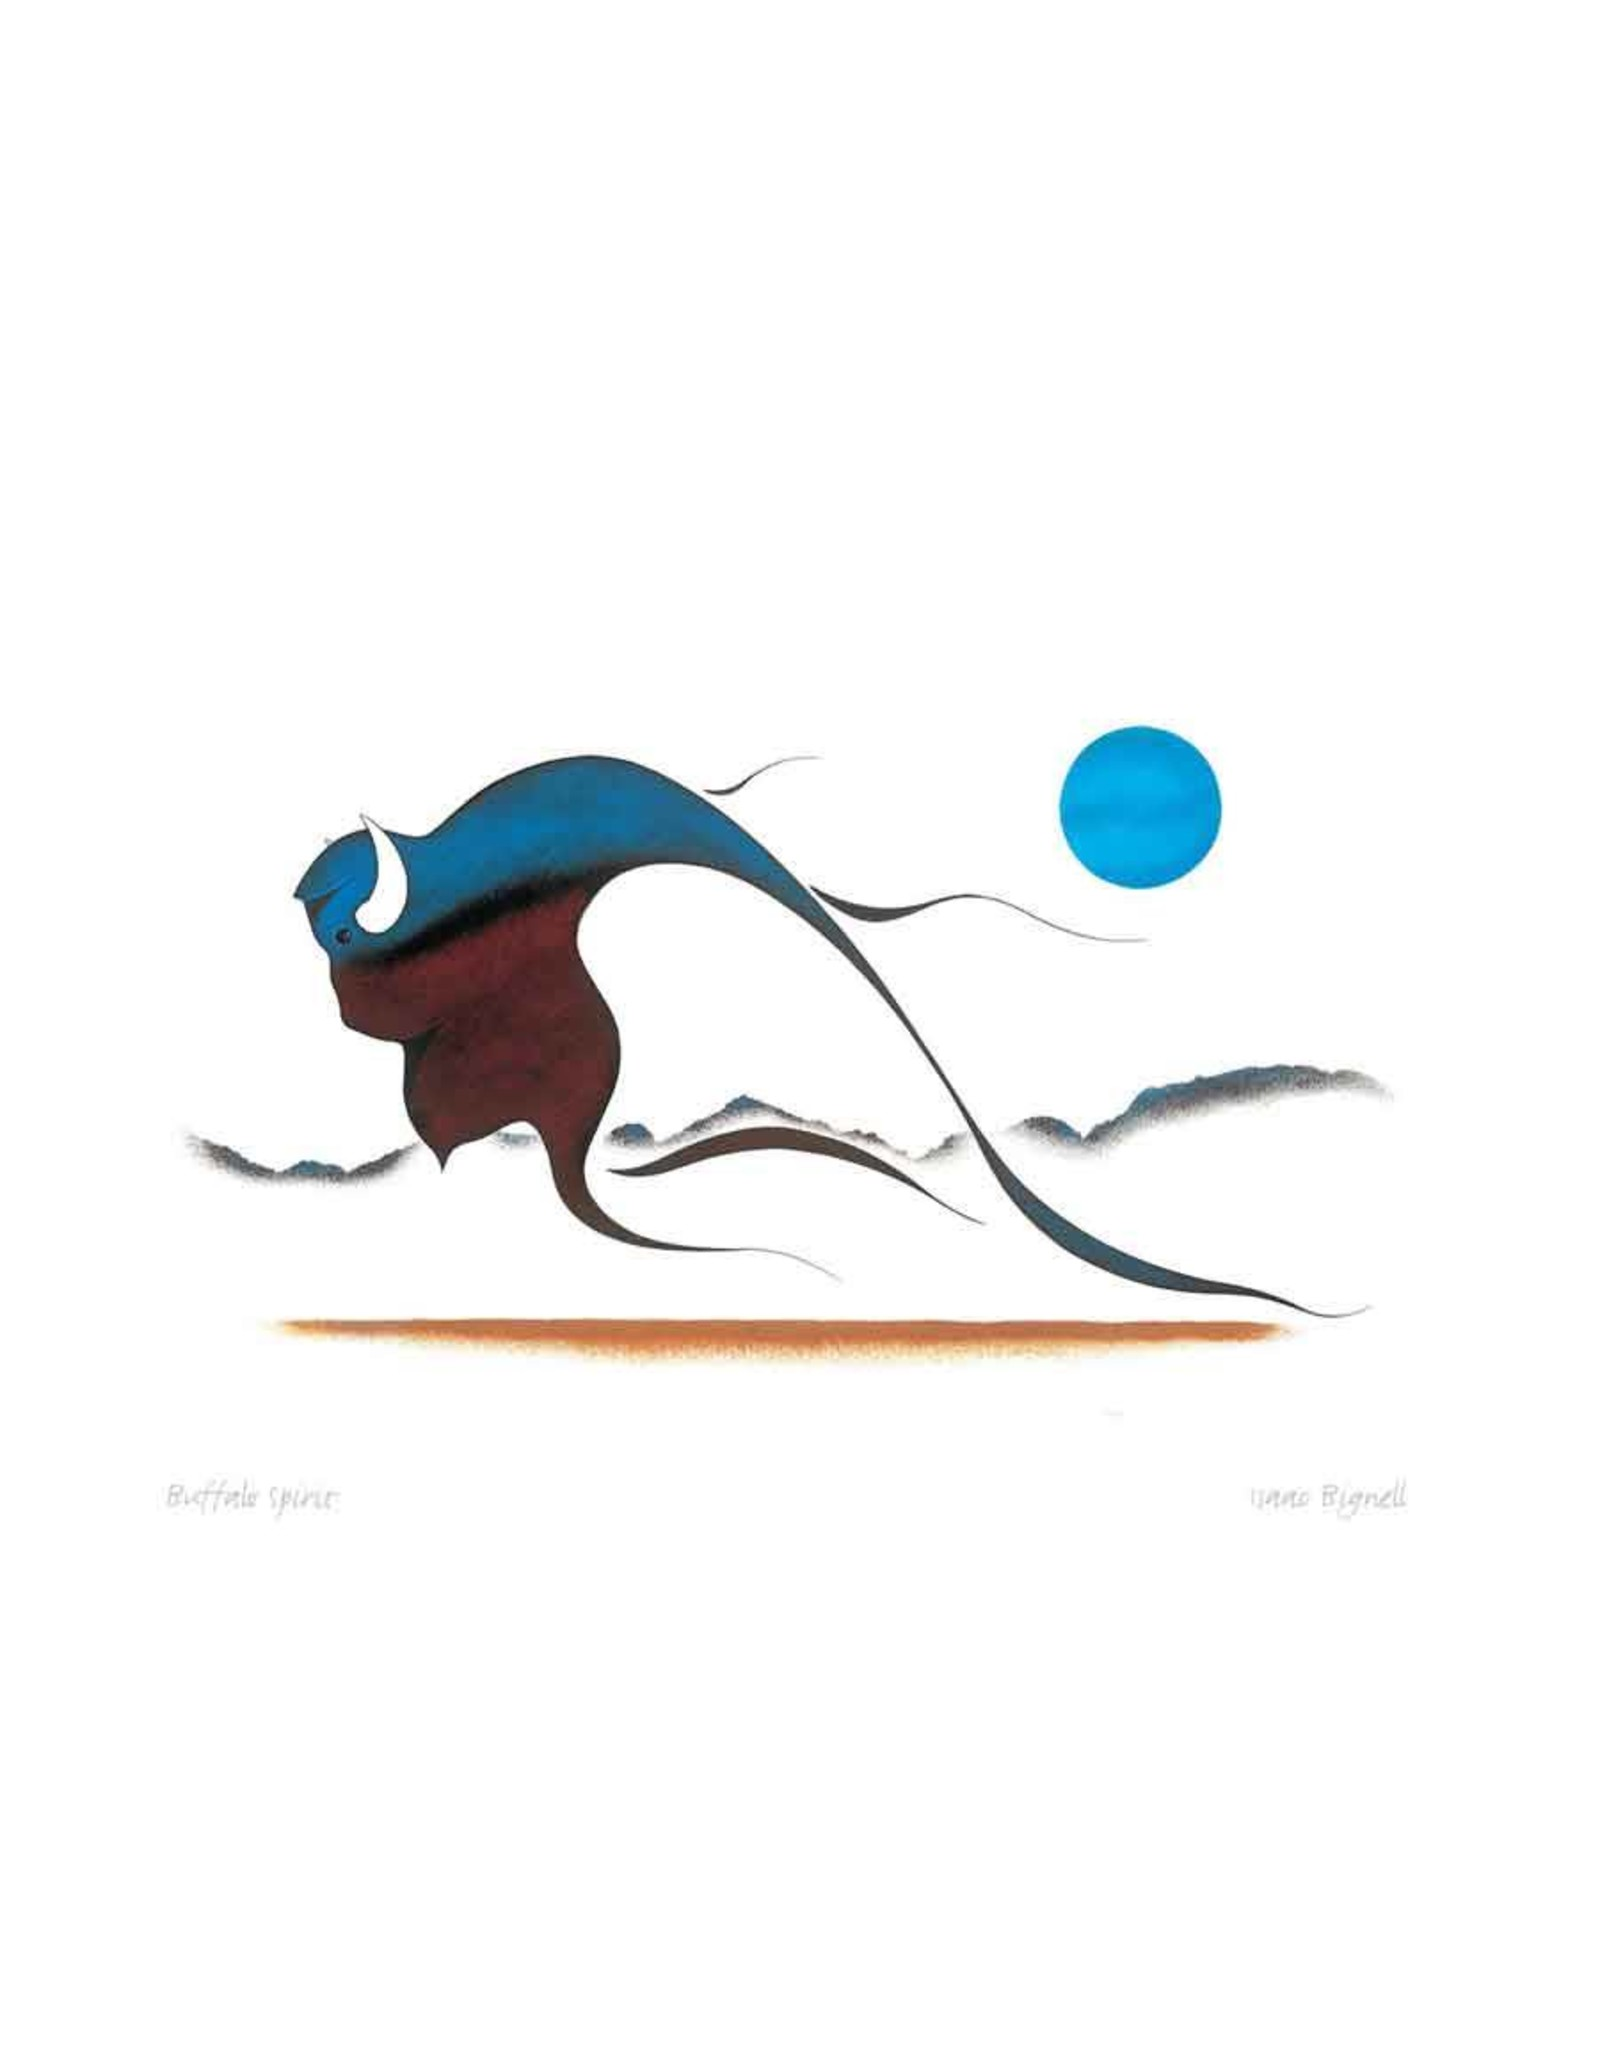 Buffalo Spirit by Isaac Bignell Card